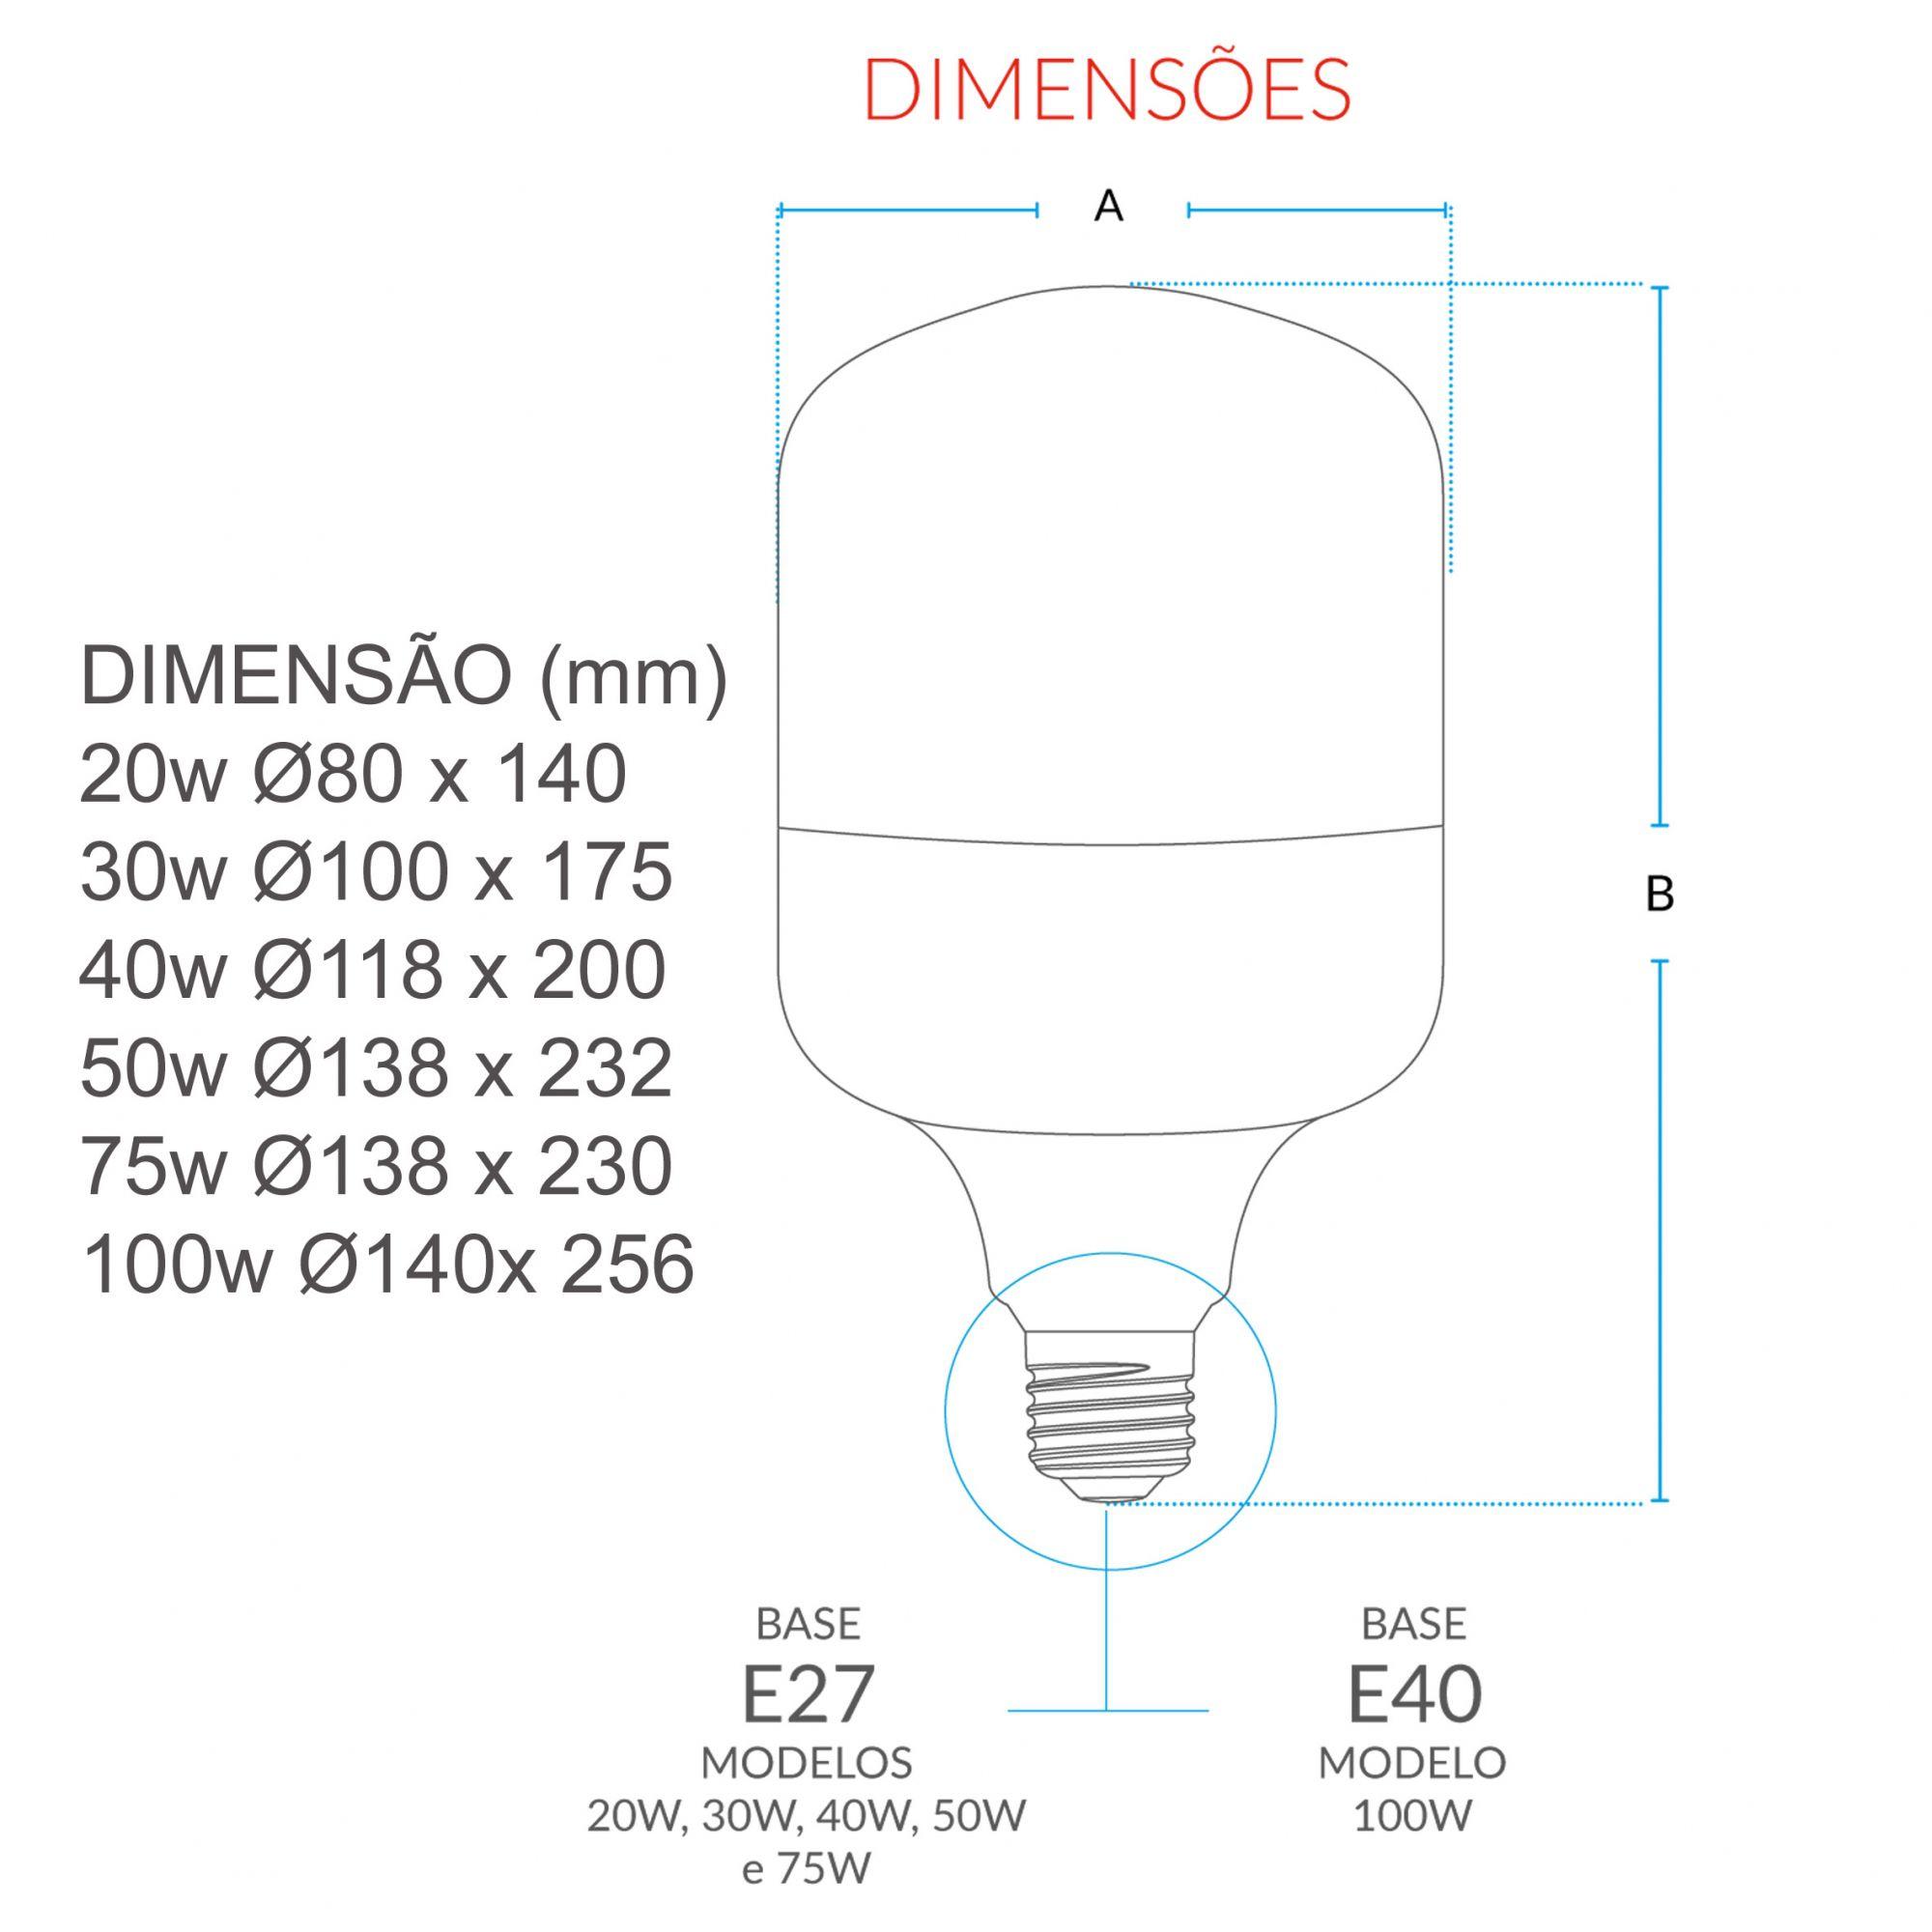 Lâmpada Led Bulbo 75w Luz Branca 6500k Avant Alta Potência  - EMPORIO K